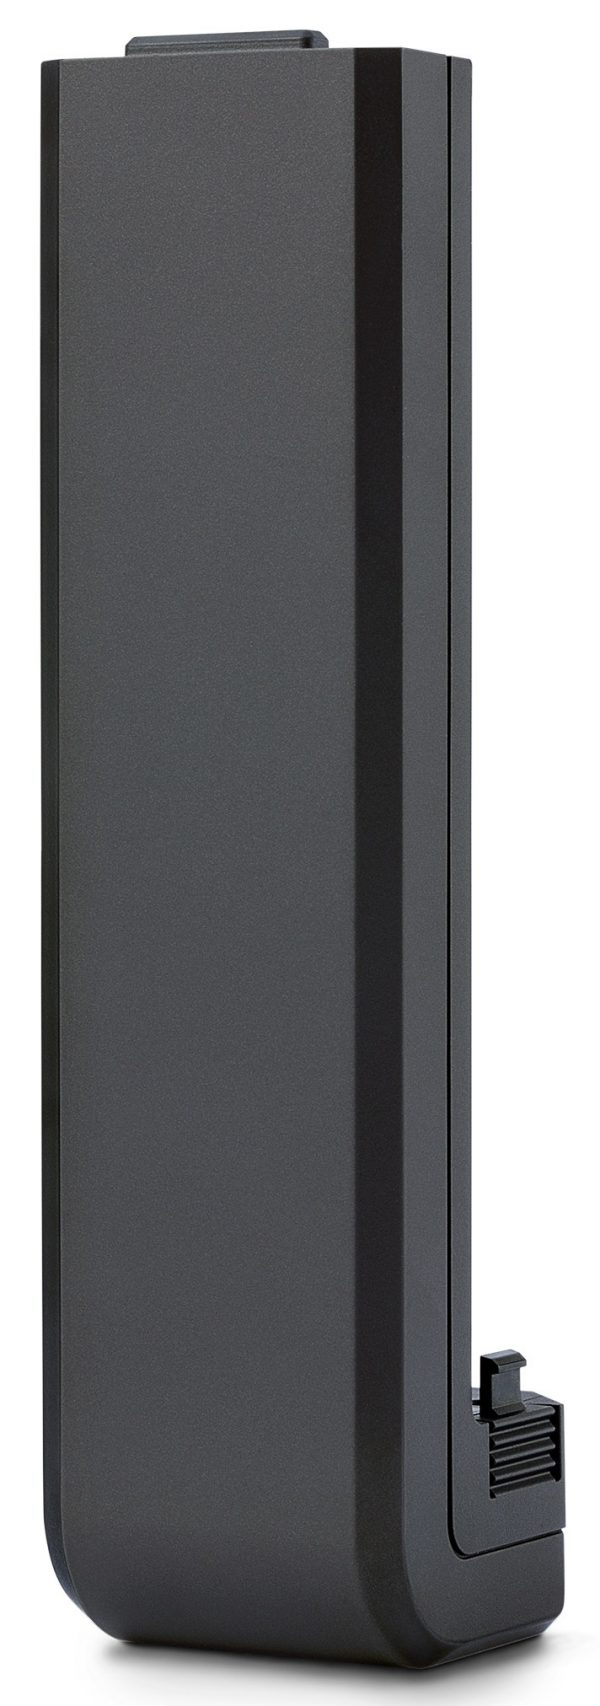 P000025